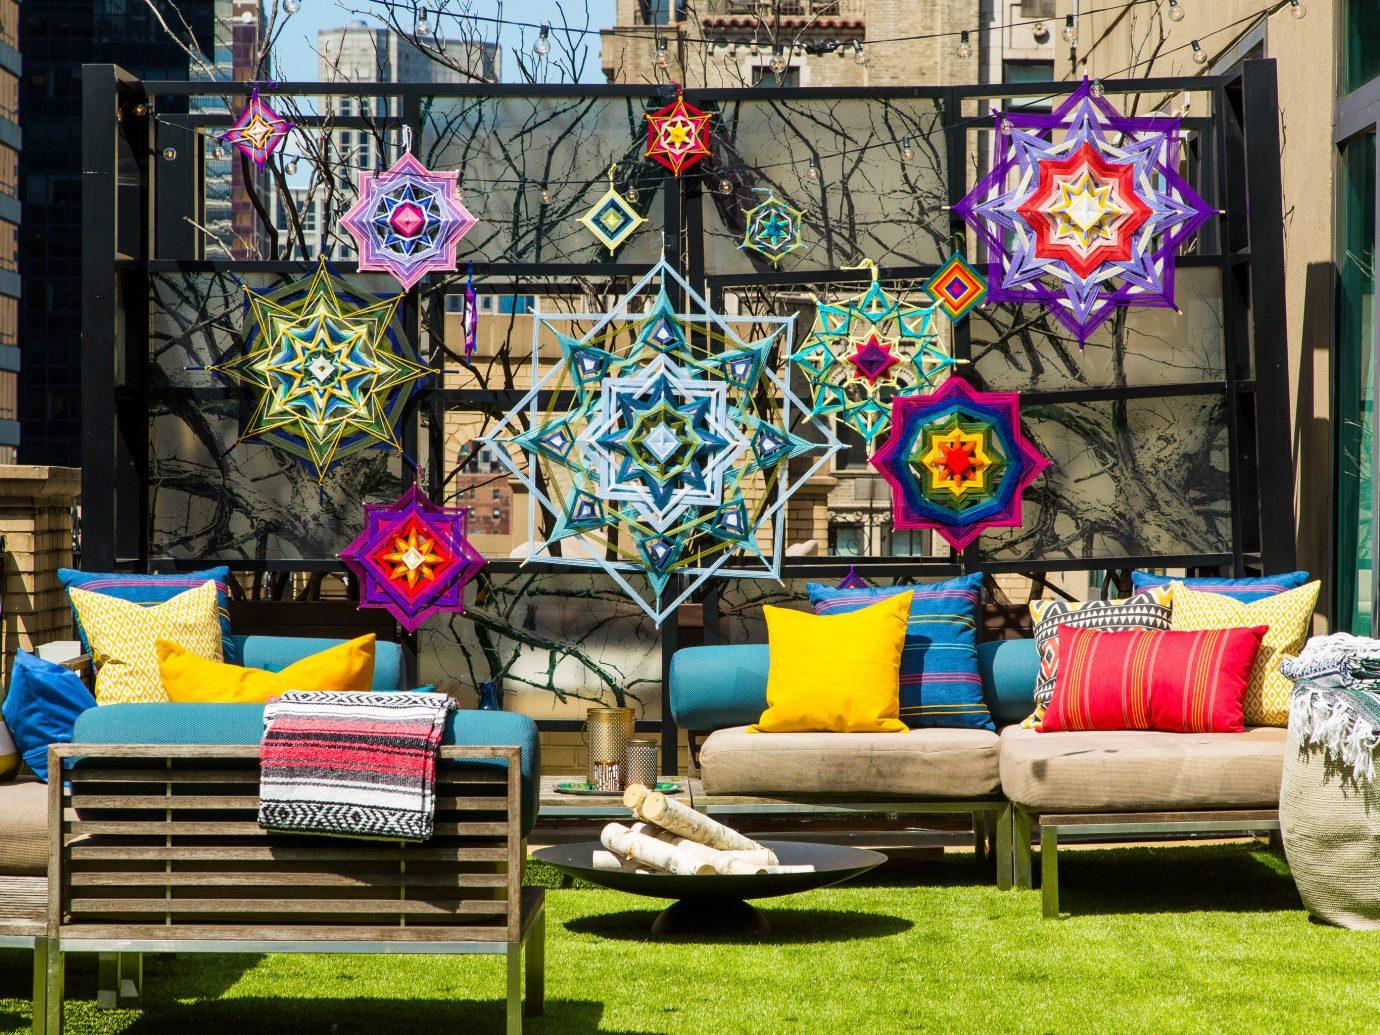 Arts + Culture grass color outdoor art home interior design window living room colorful